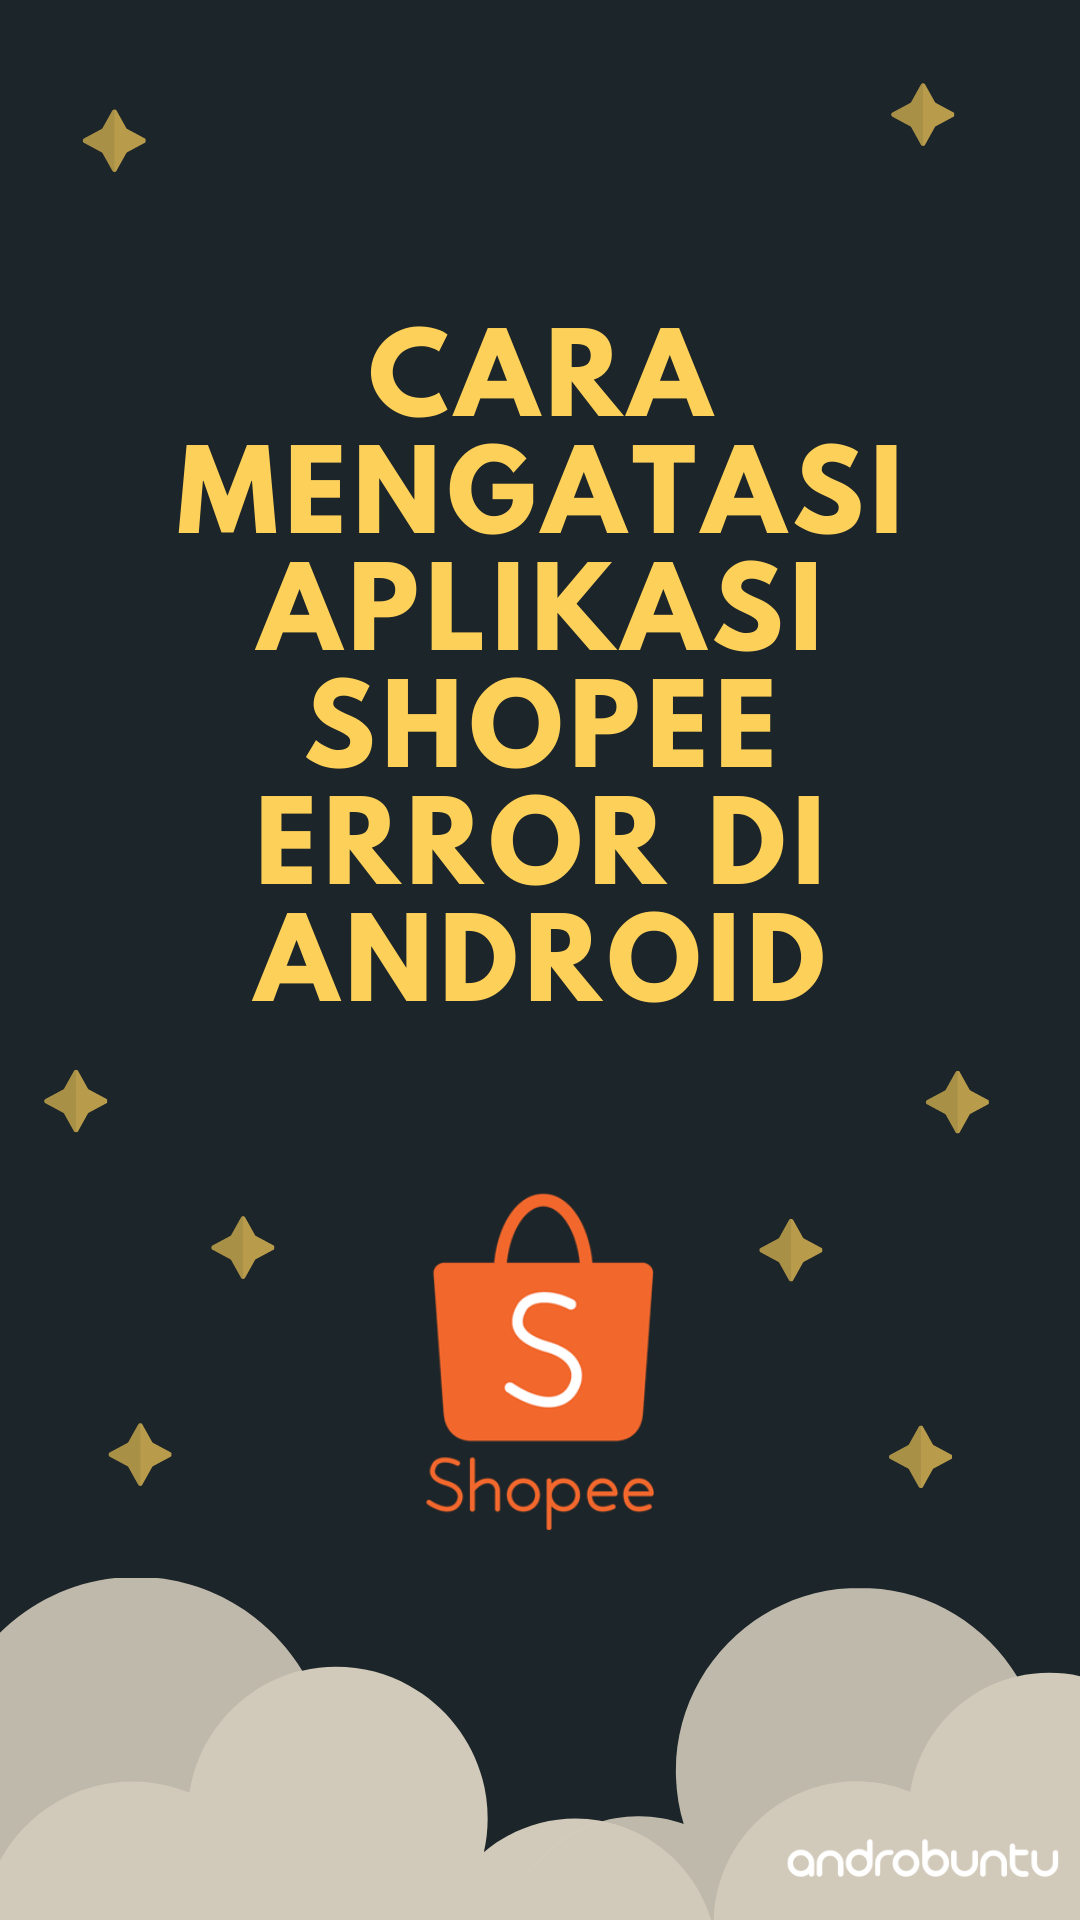 5 Cara Mengatasi Aplikasi Shopee Error Di Android Aplikasi Pengikut Android